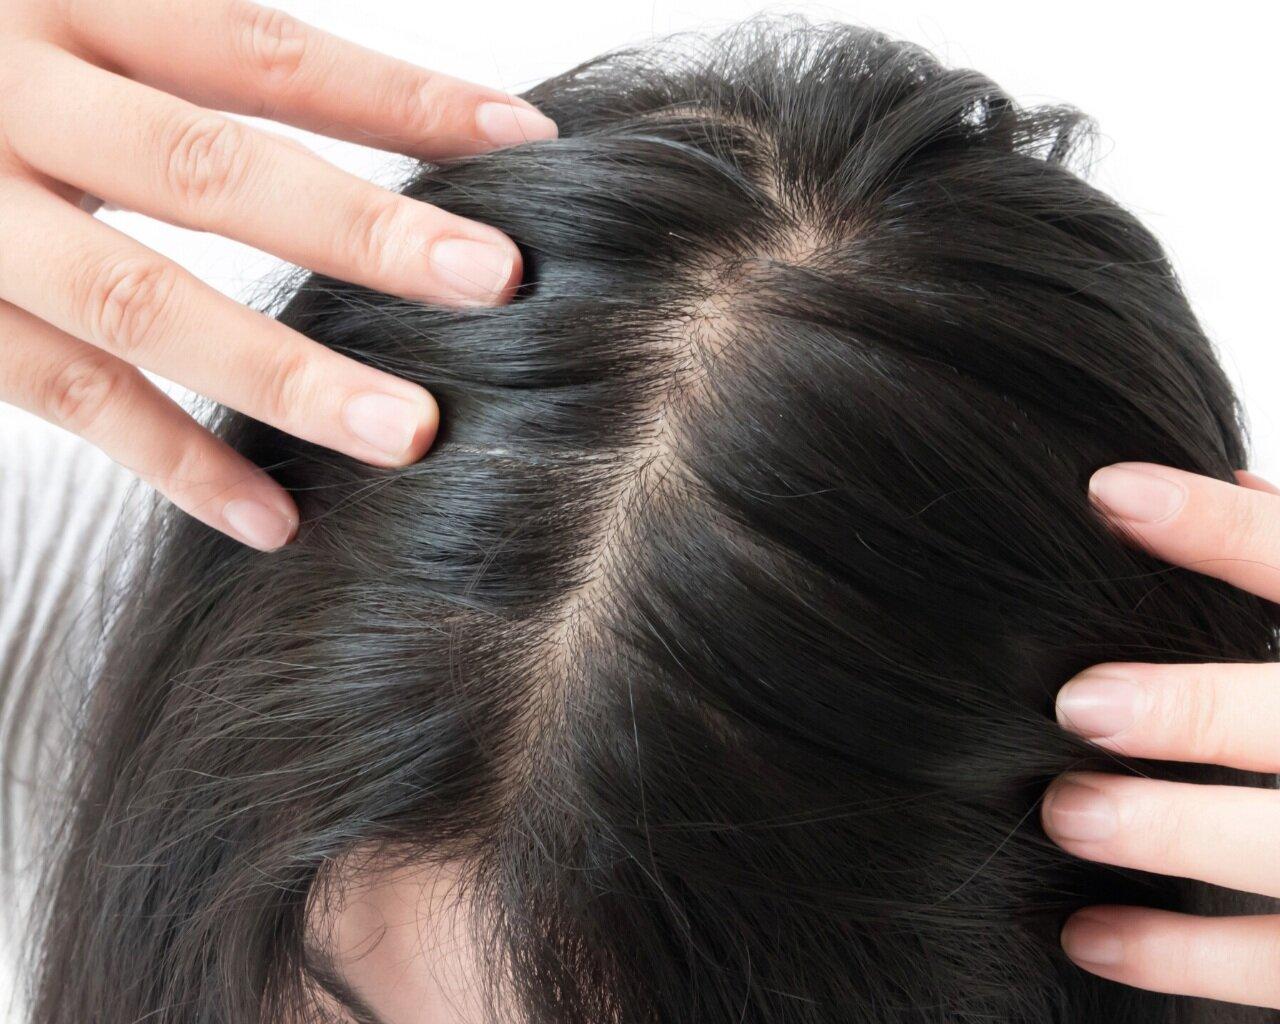 Thin Dry Frizzy Menopause Hair Oh My Lisa Health Blog